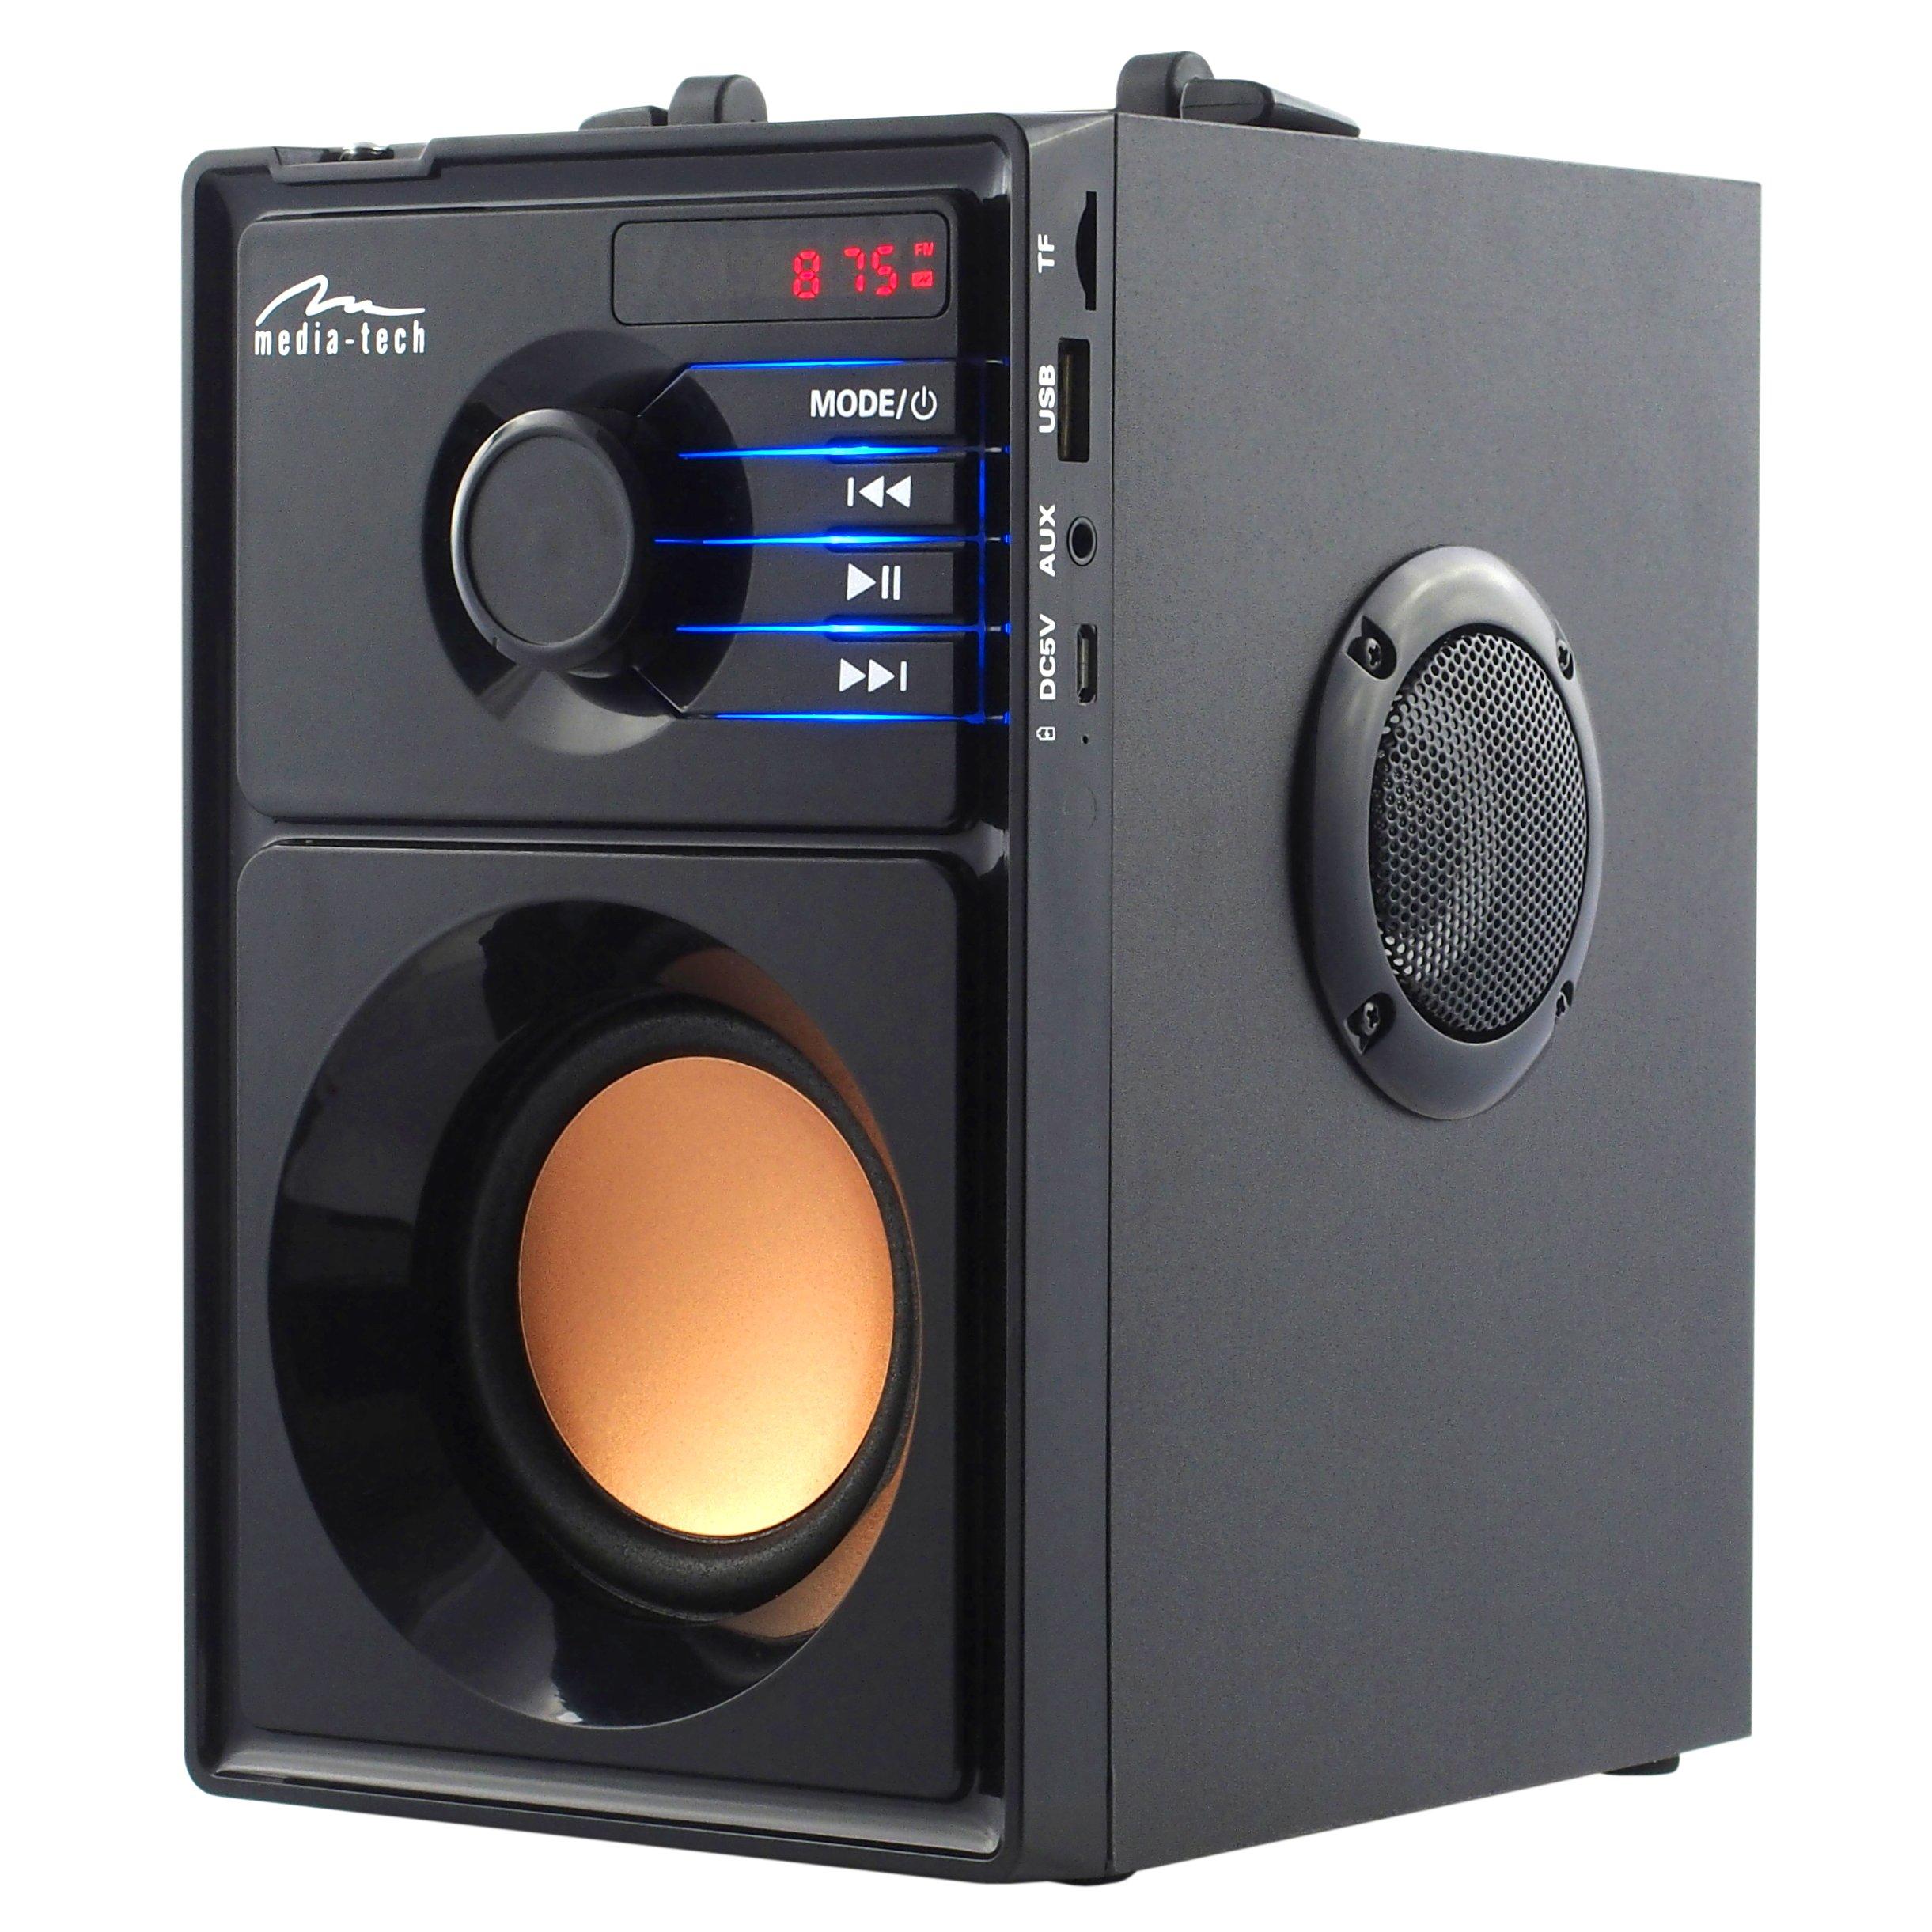 Media-Tech MT3145 15 Вт MP3 стерео динамик Bluetooth